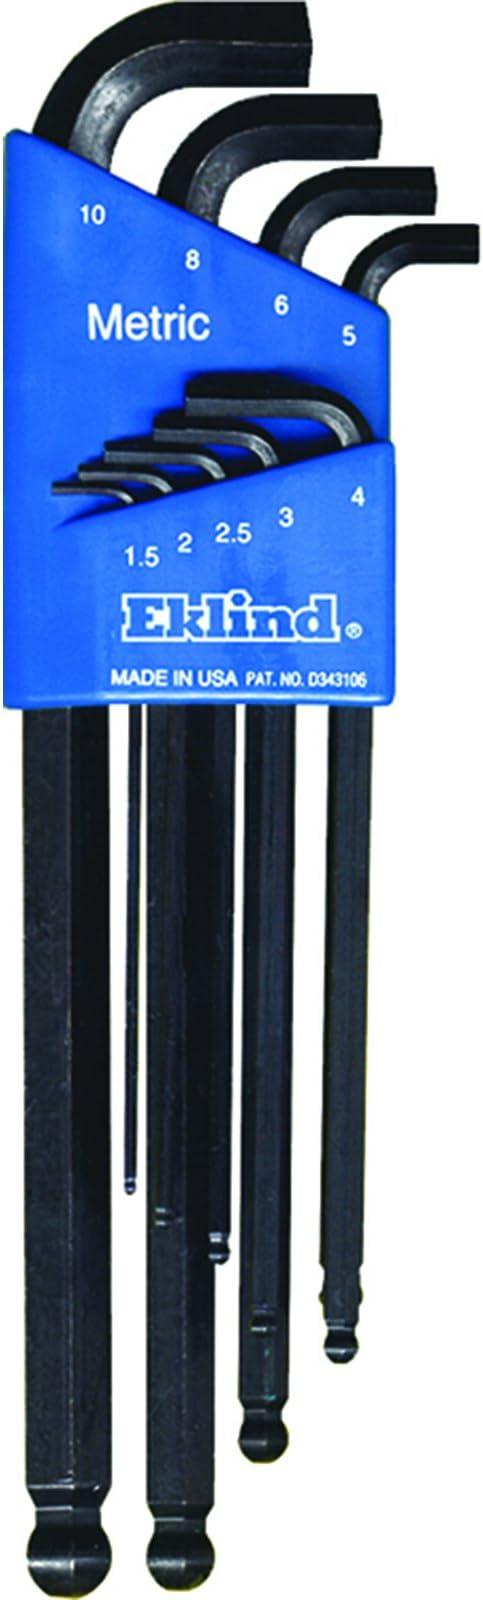 Eklind 13509 Hex Key